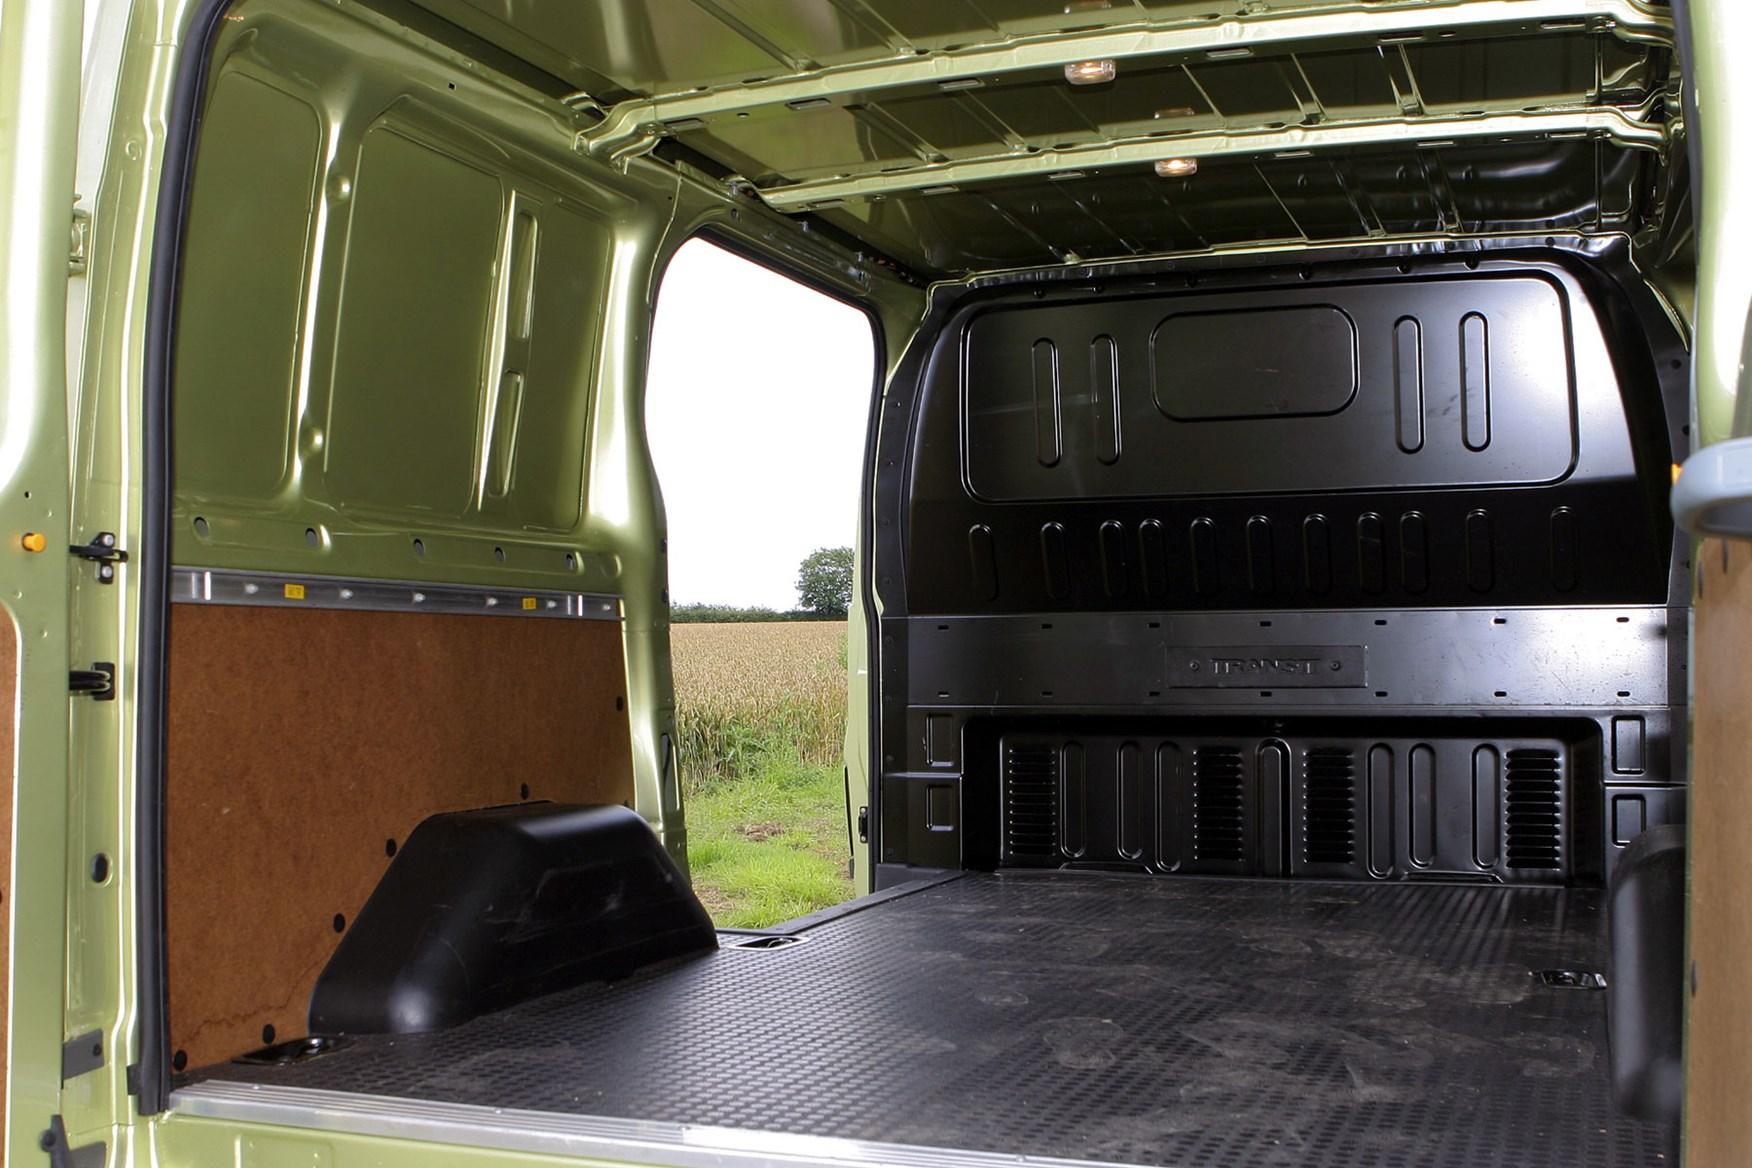 Ford Transit van dimensions (2006-2013), capacity, payload, volume